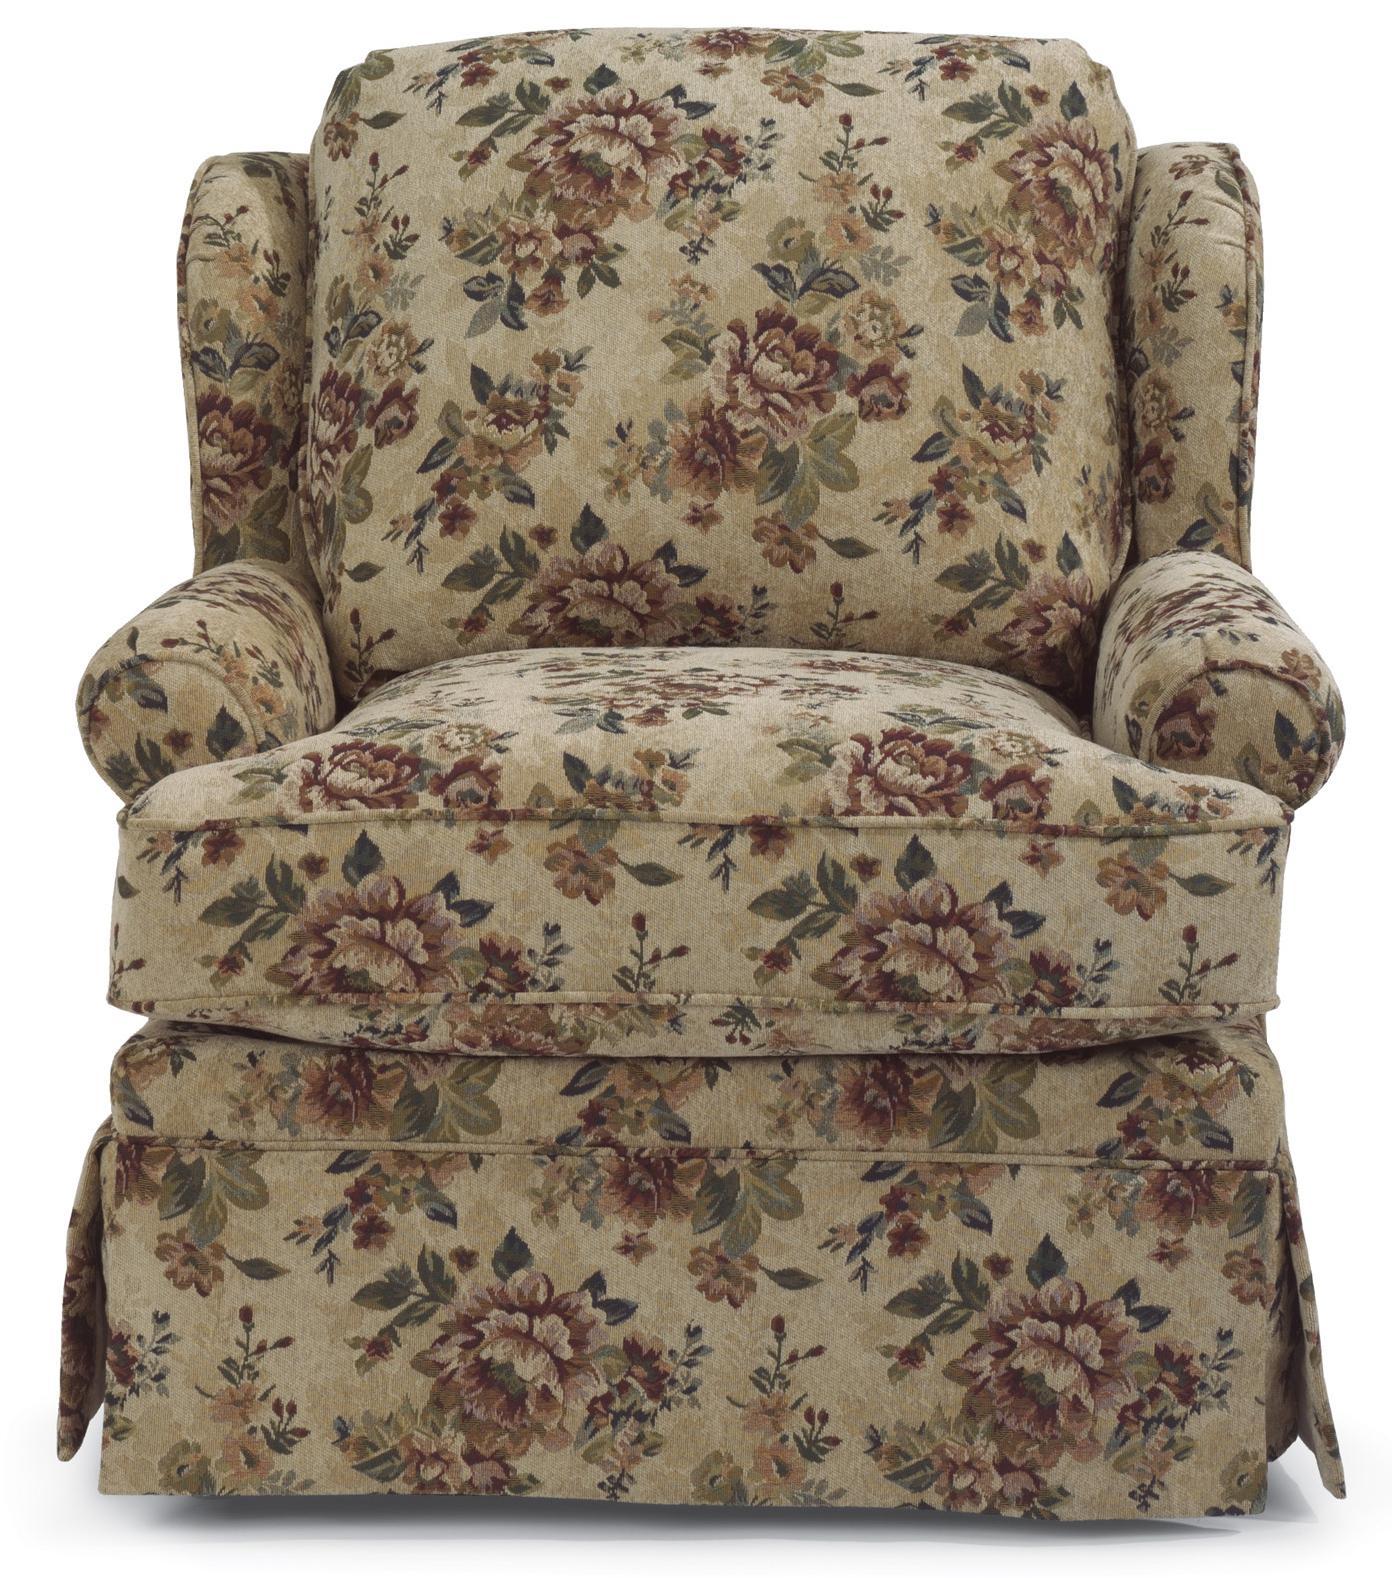 Flexsteel Danville Upholstered Chair - Item Number: 5948-10